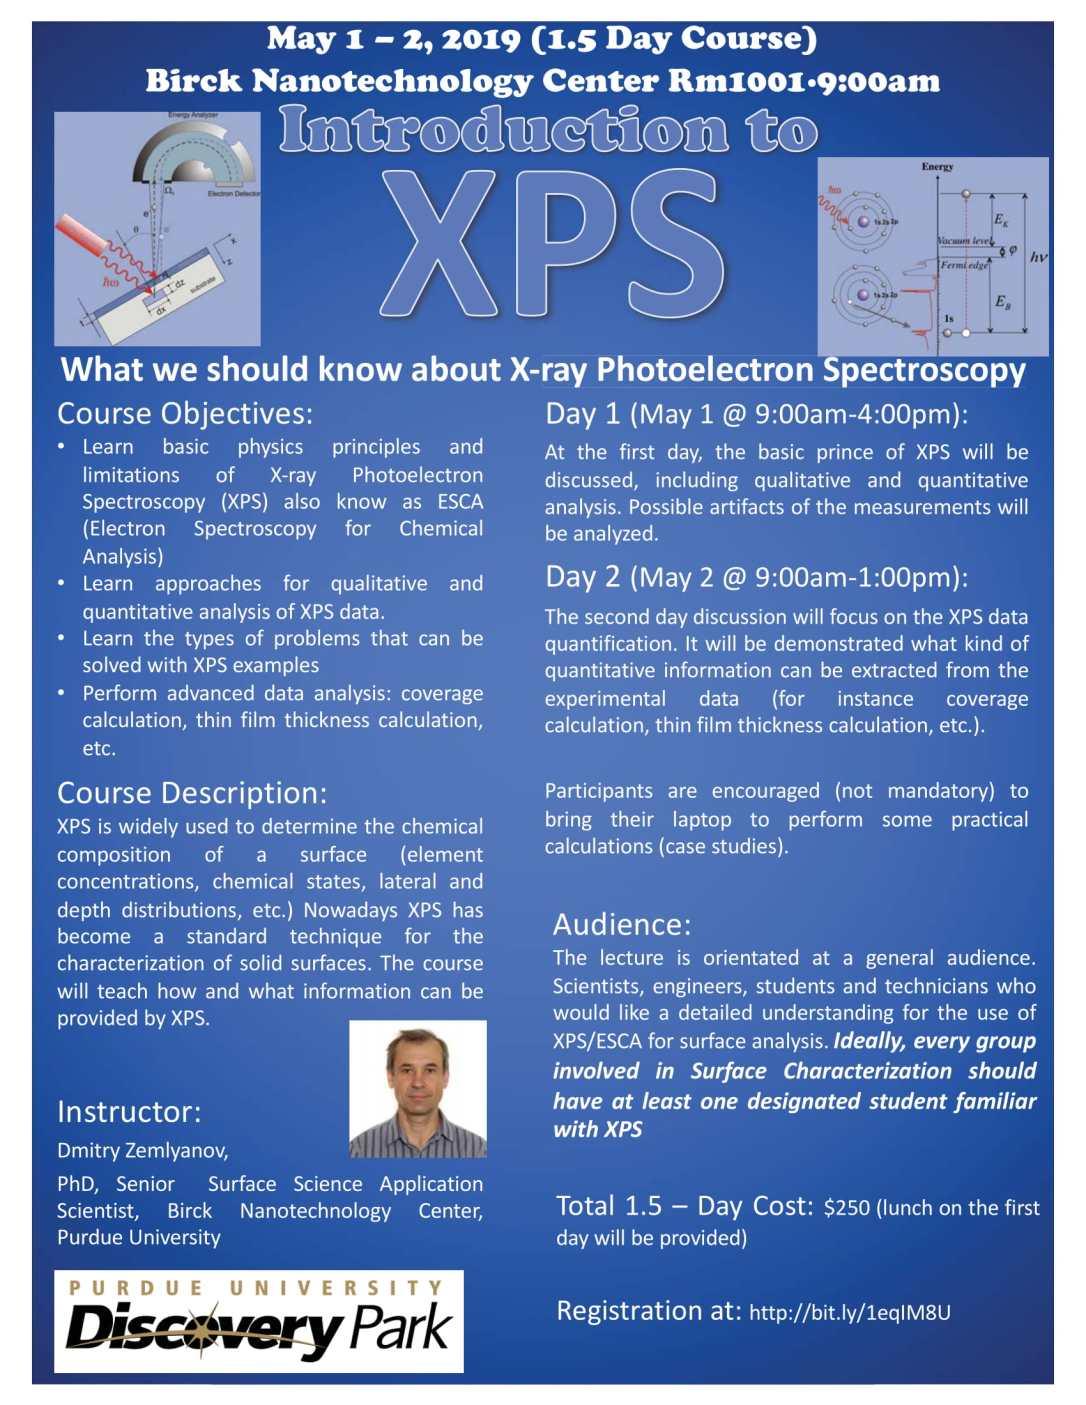 Introduction to XPS: 1 5 Day Course through Birck Nanotech